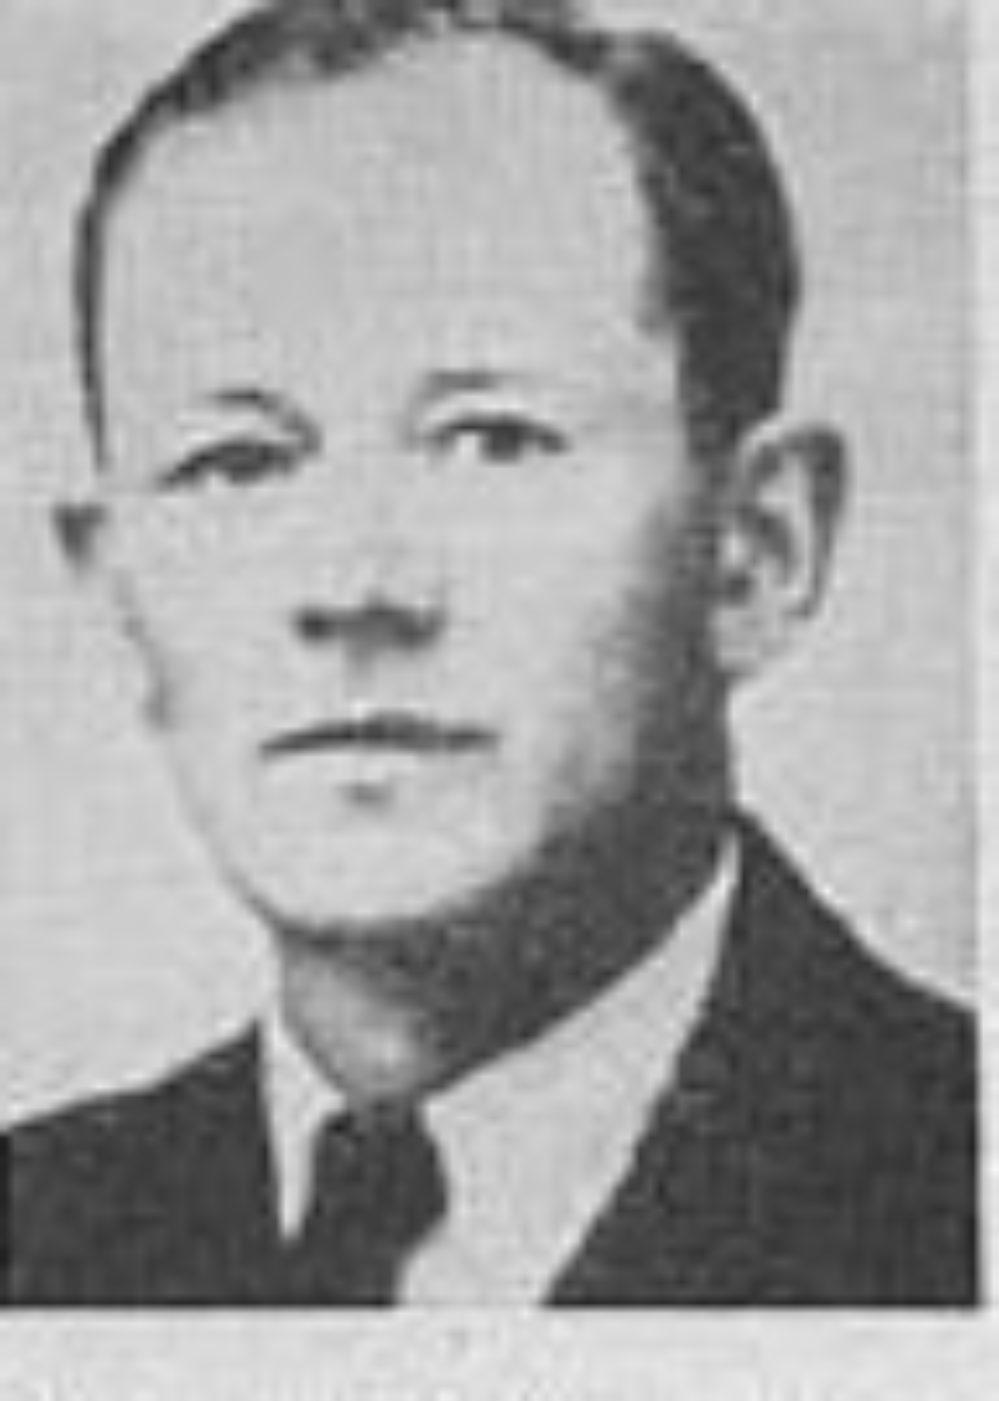 Bernhard Kornelius Skår